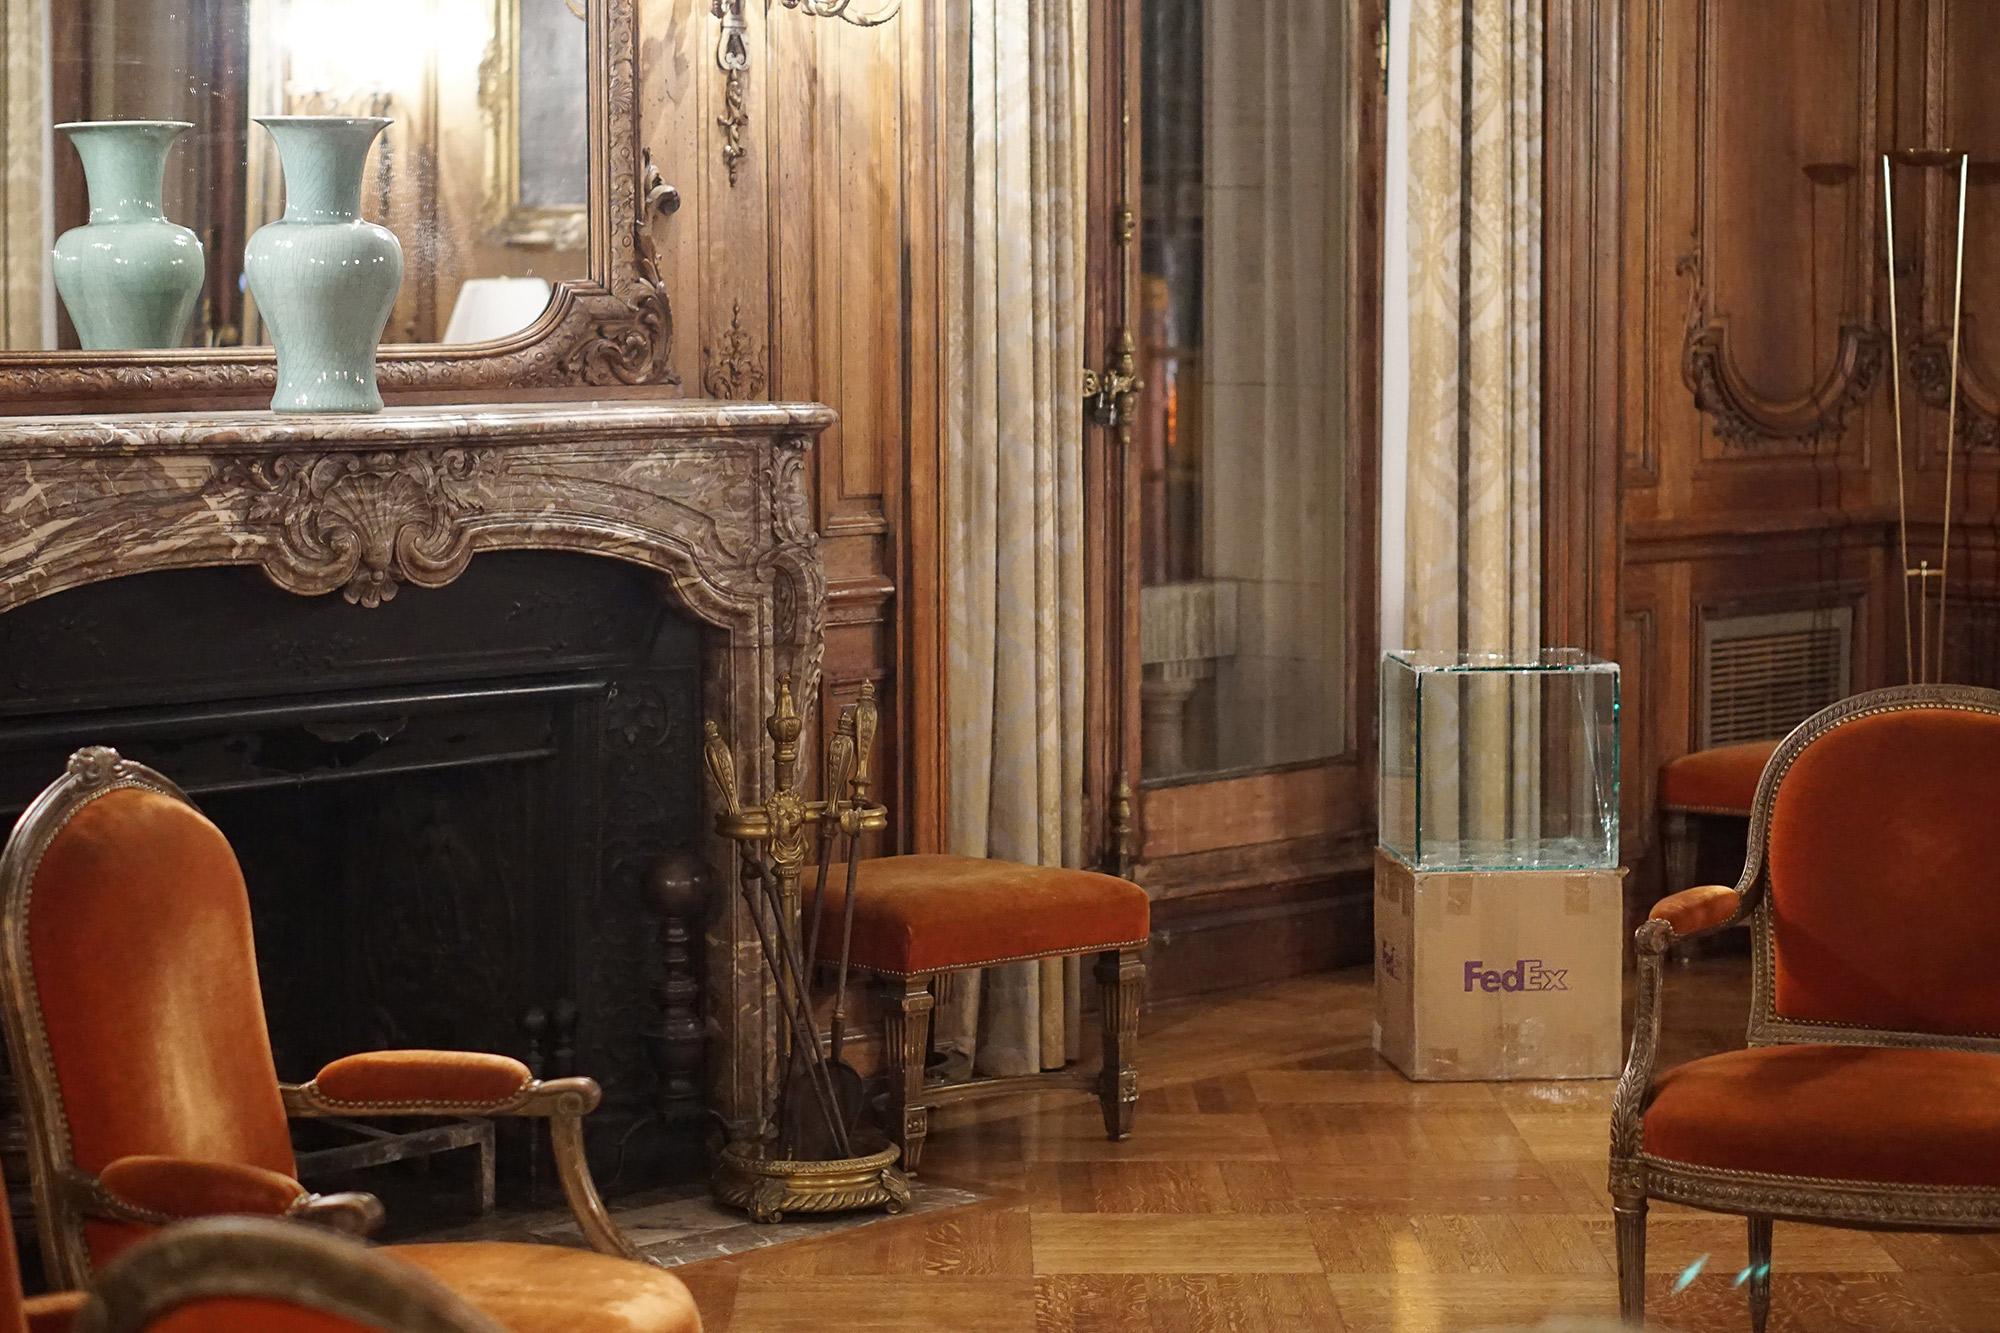 Great Hall Exhibition   Institute of Fine Arts  New York University  New York  New York  2015